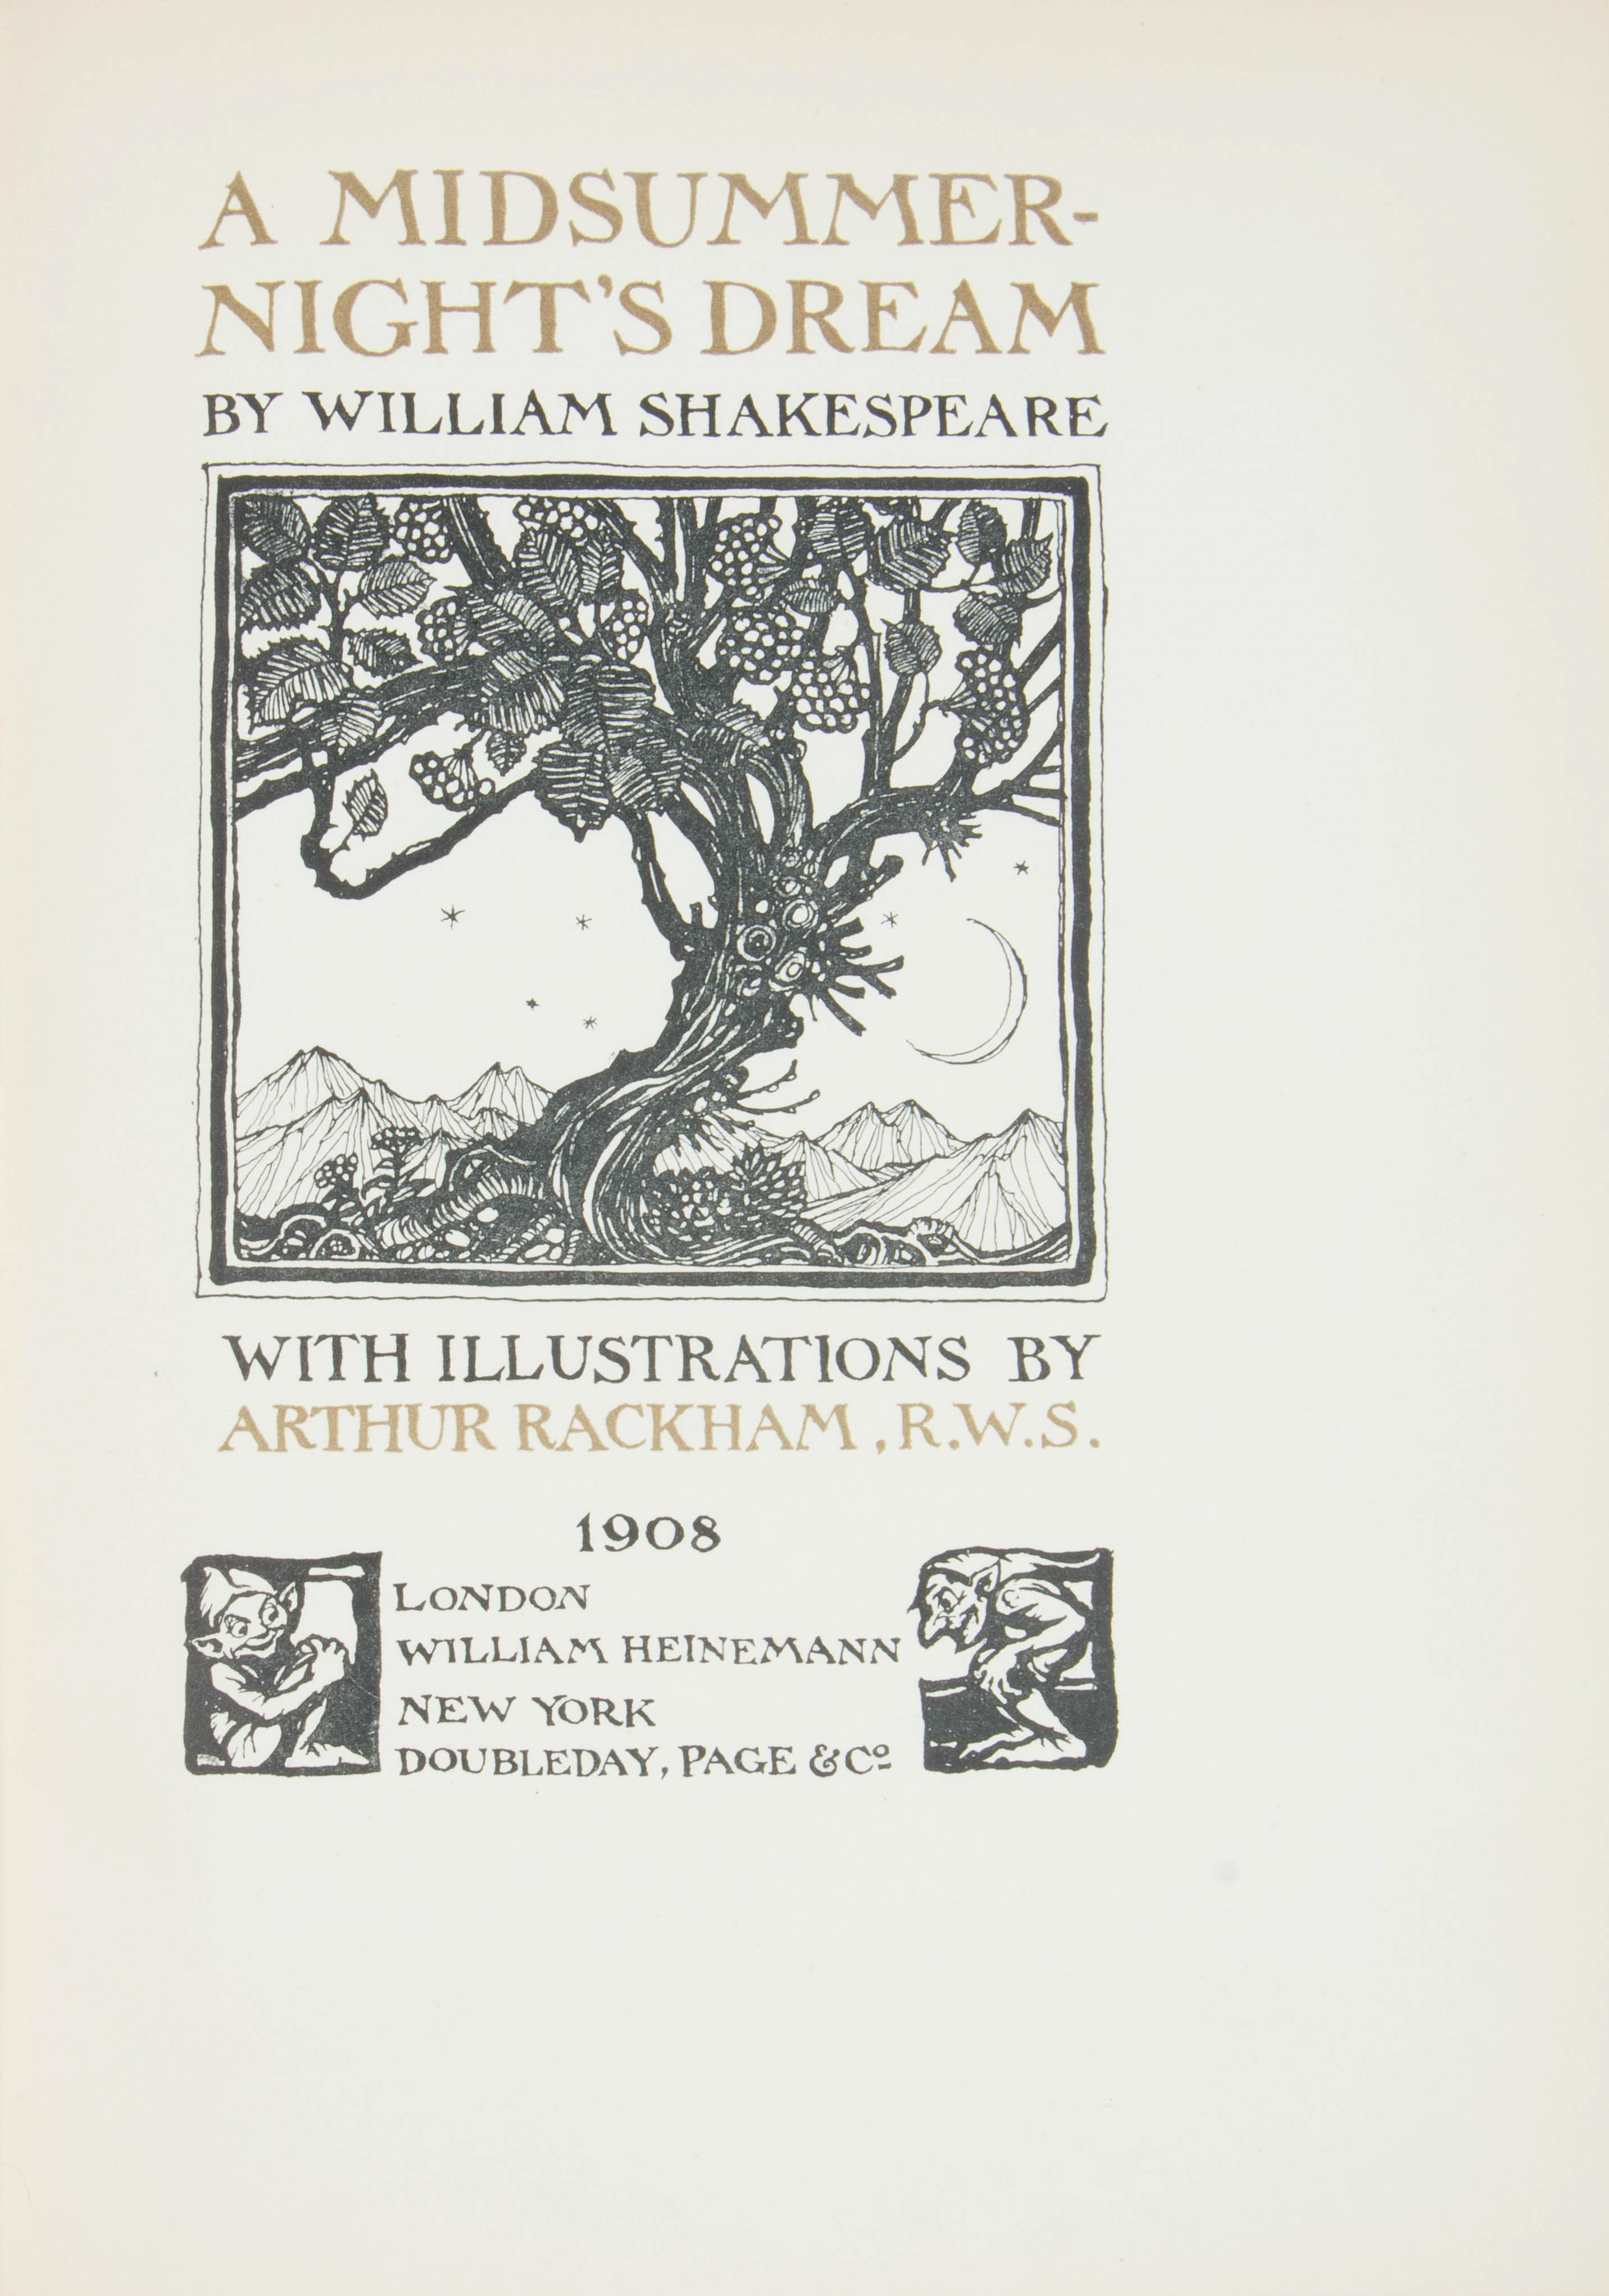 1908 MIDSUMMER NIGHT'S DREAM BY WILLIAM SHAKESPEARE, ILLUSTRATIONS BY ARTHUR RACKHAM - Image 4 of 7